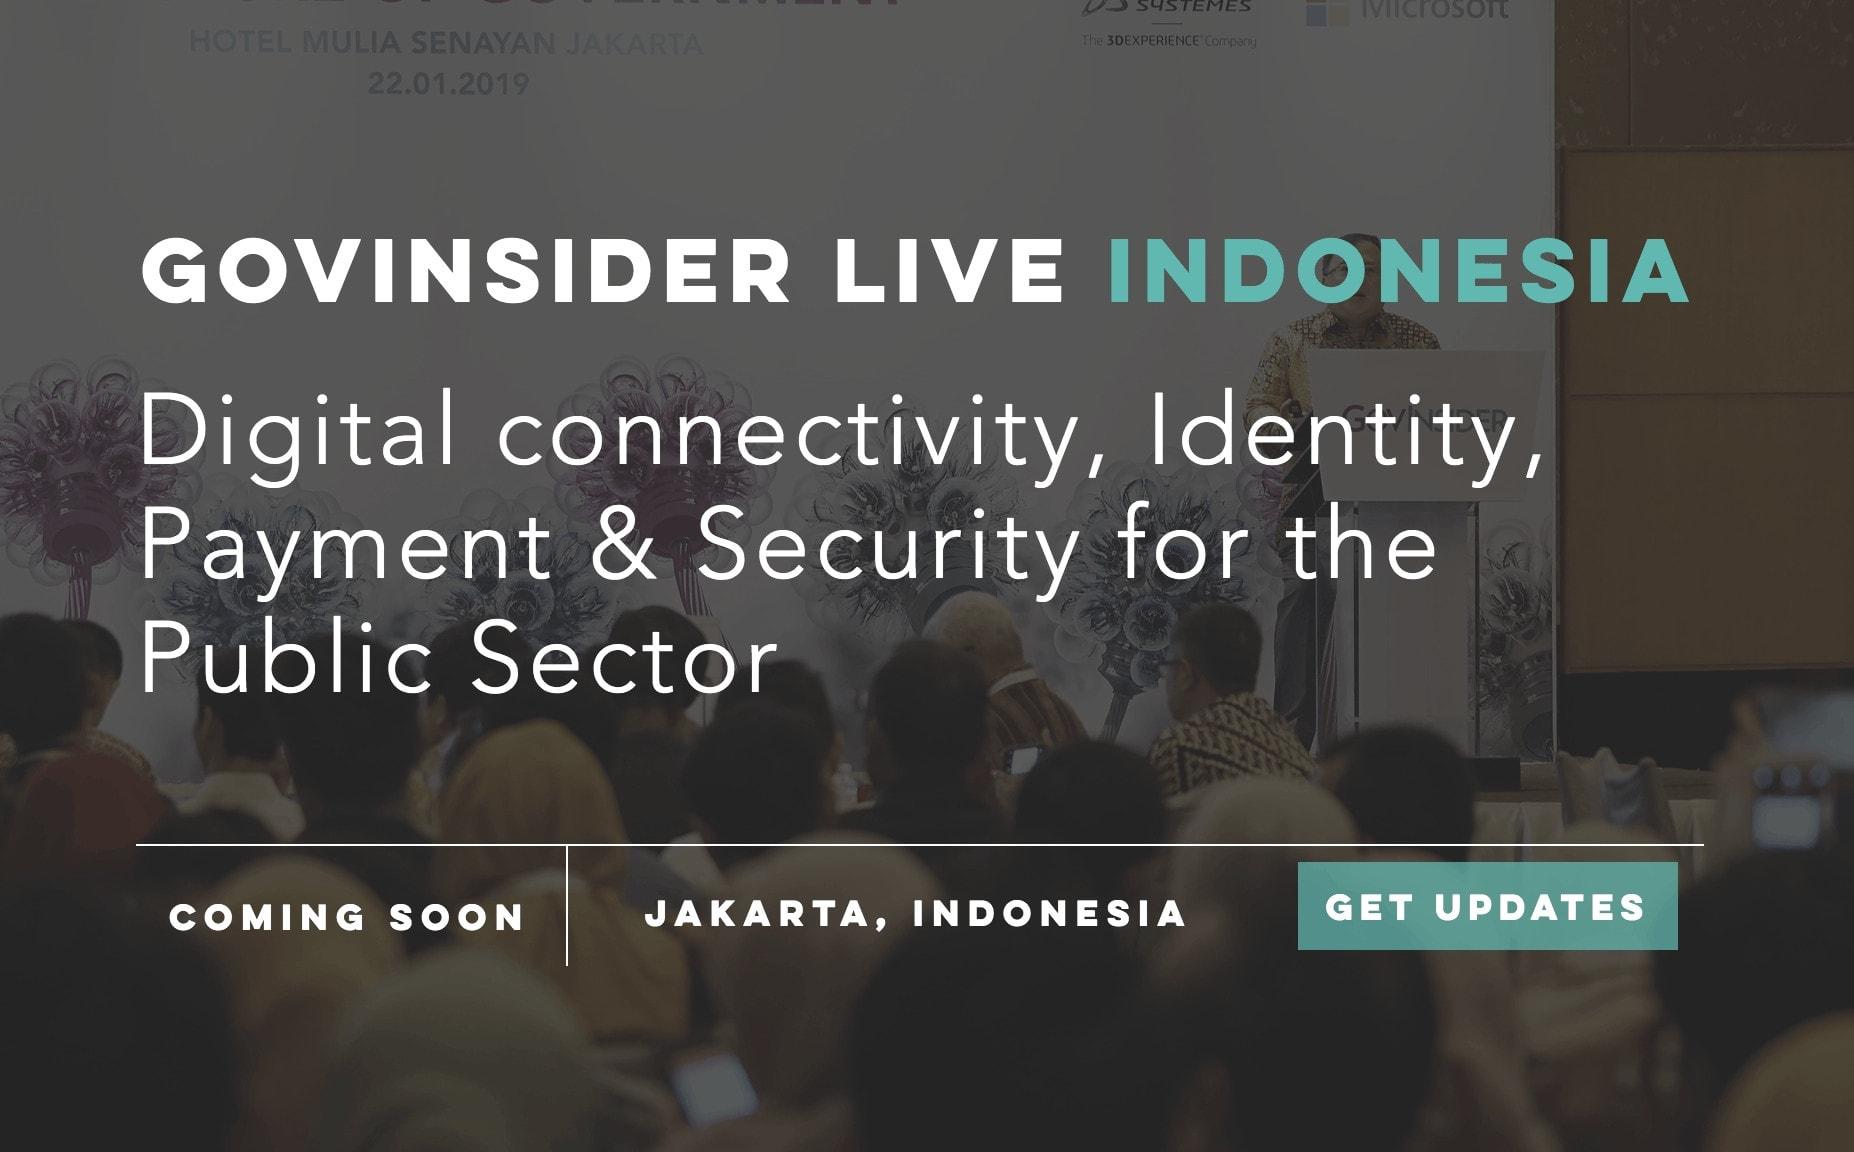 Govinsider Live Indonesia 1